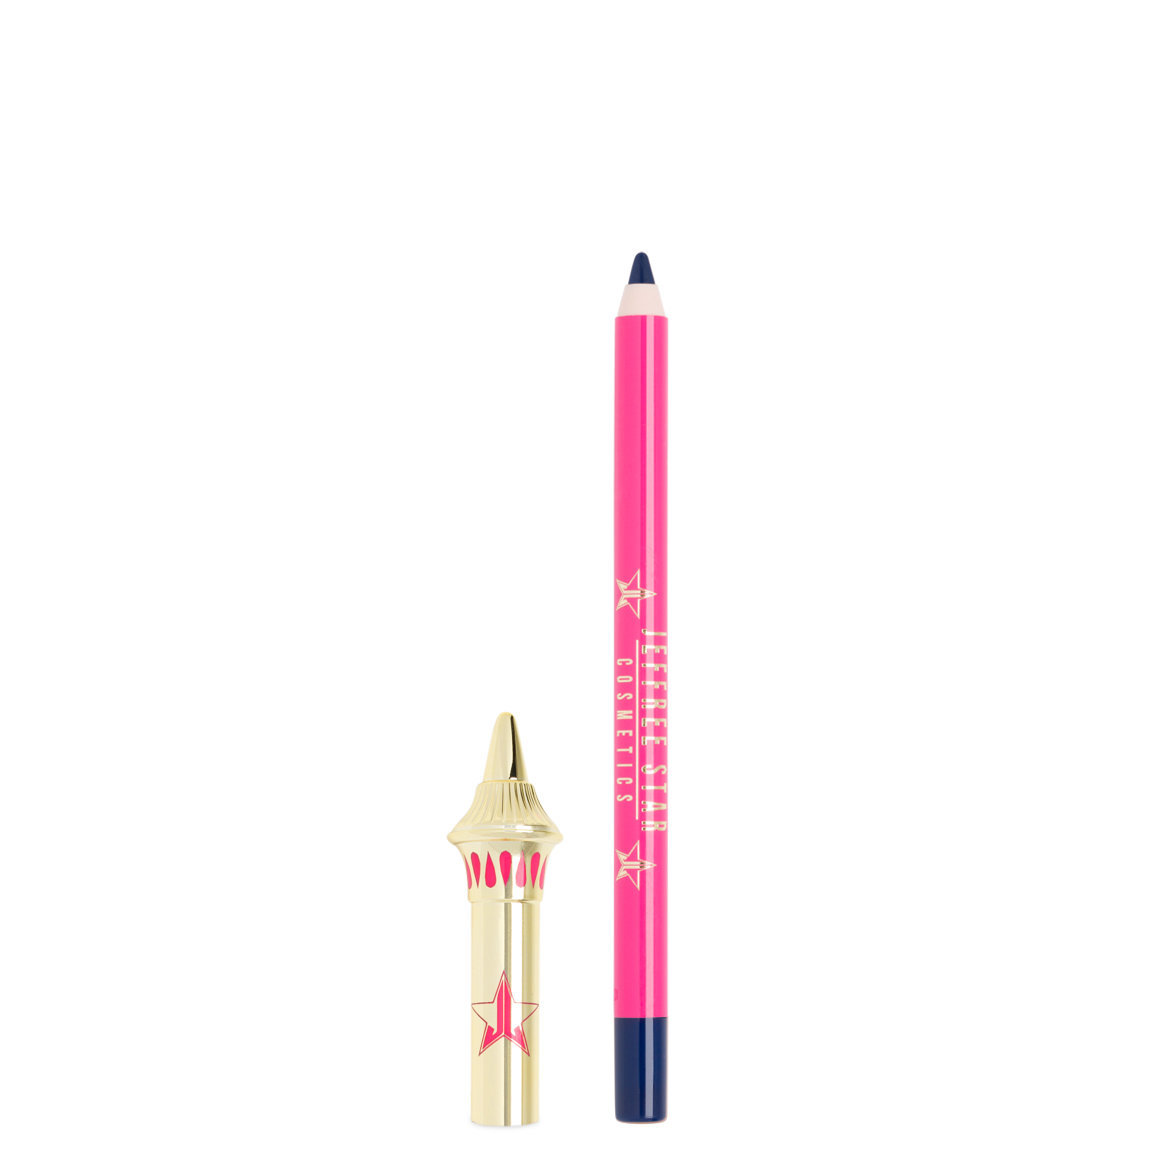 Jeffree Star Cosmetics Velour Lip Liner Blue Velvet alternative view 1.